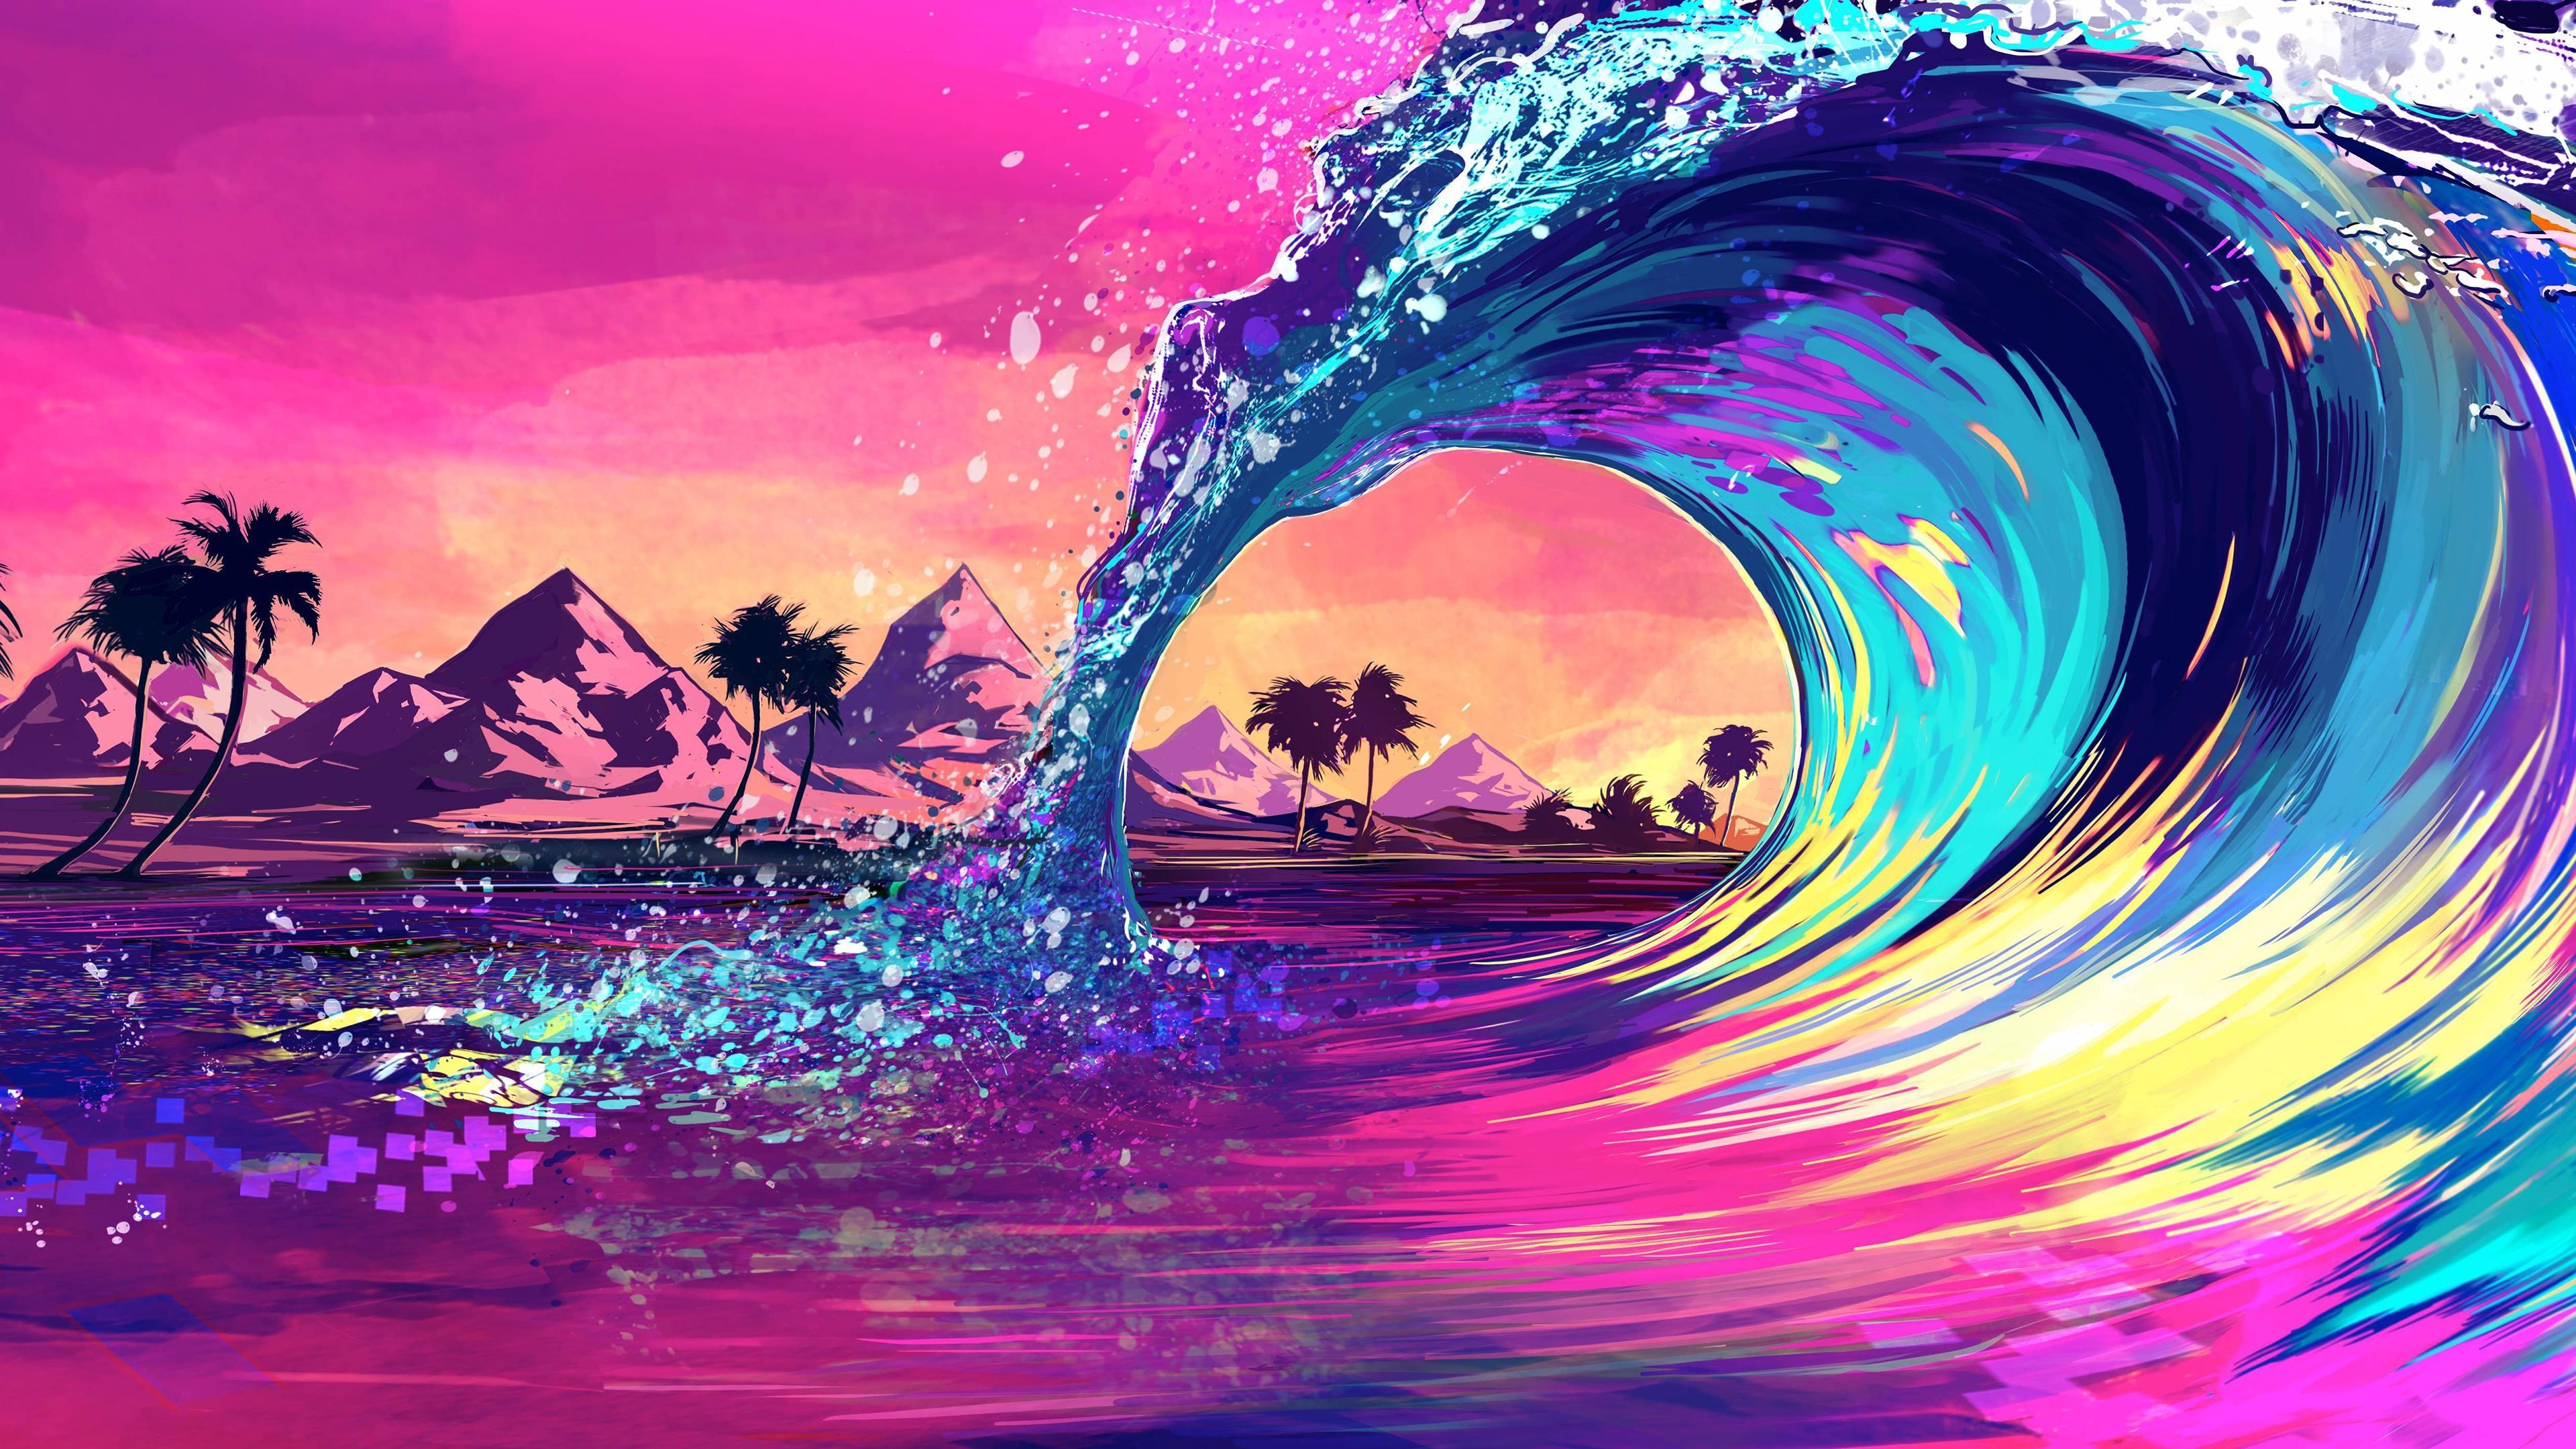 Retro Wave Ocean Wallpaper, HD Artist 4K Wallpapers ...